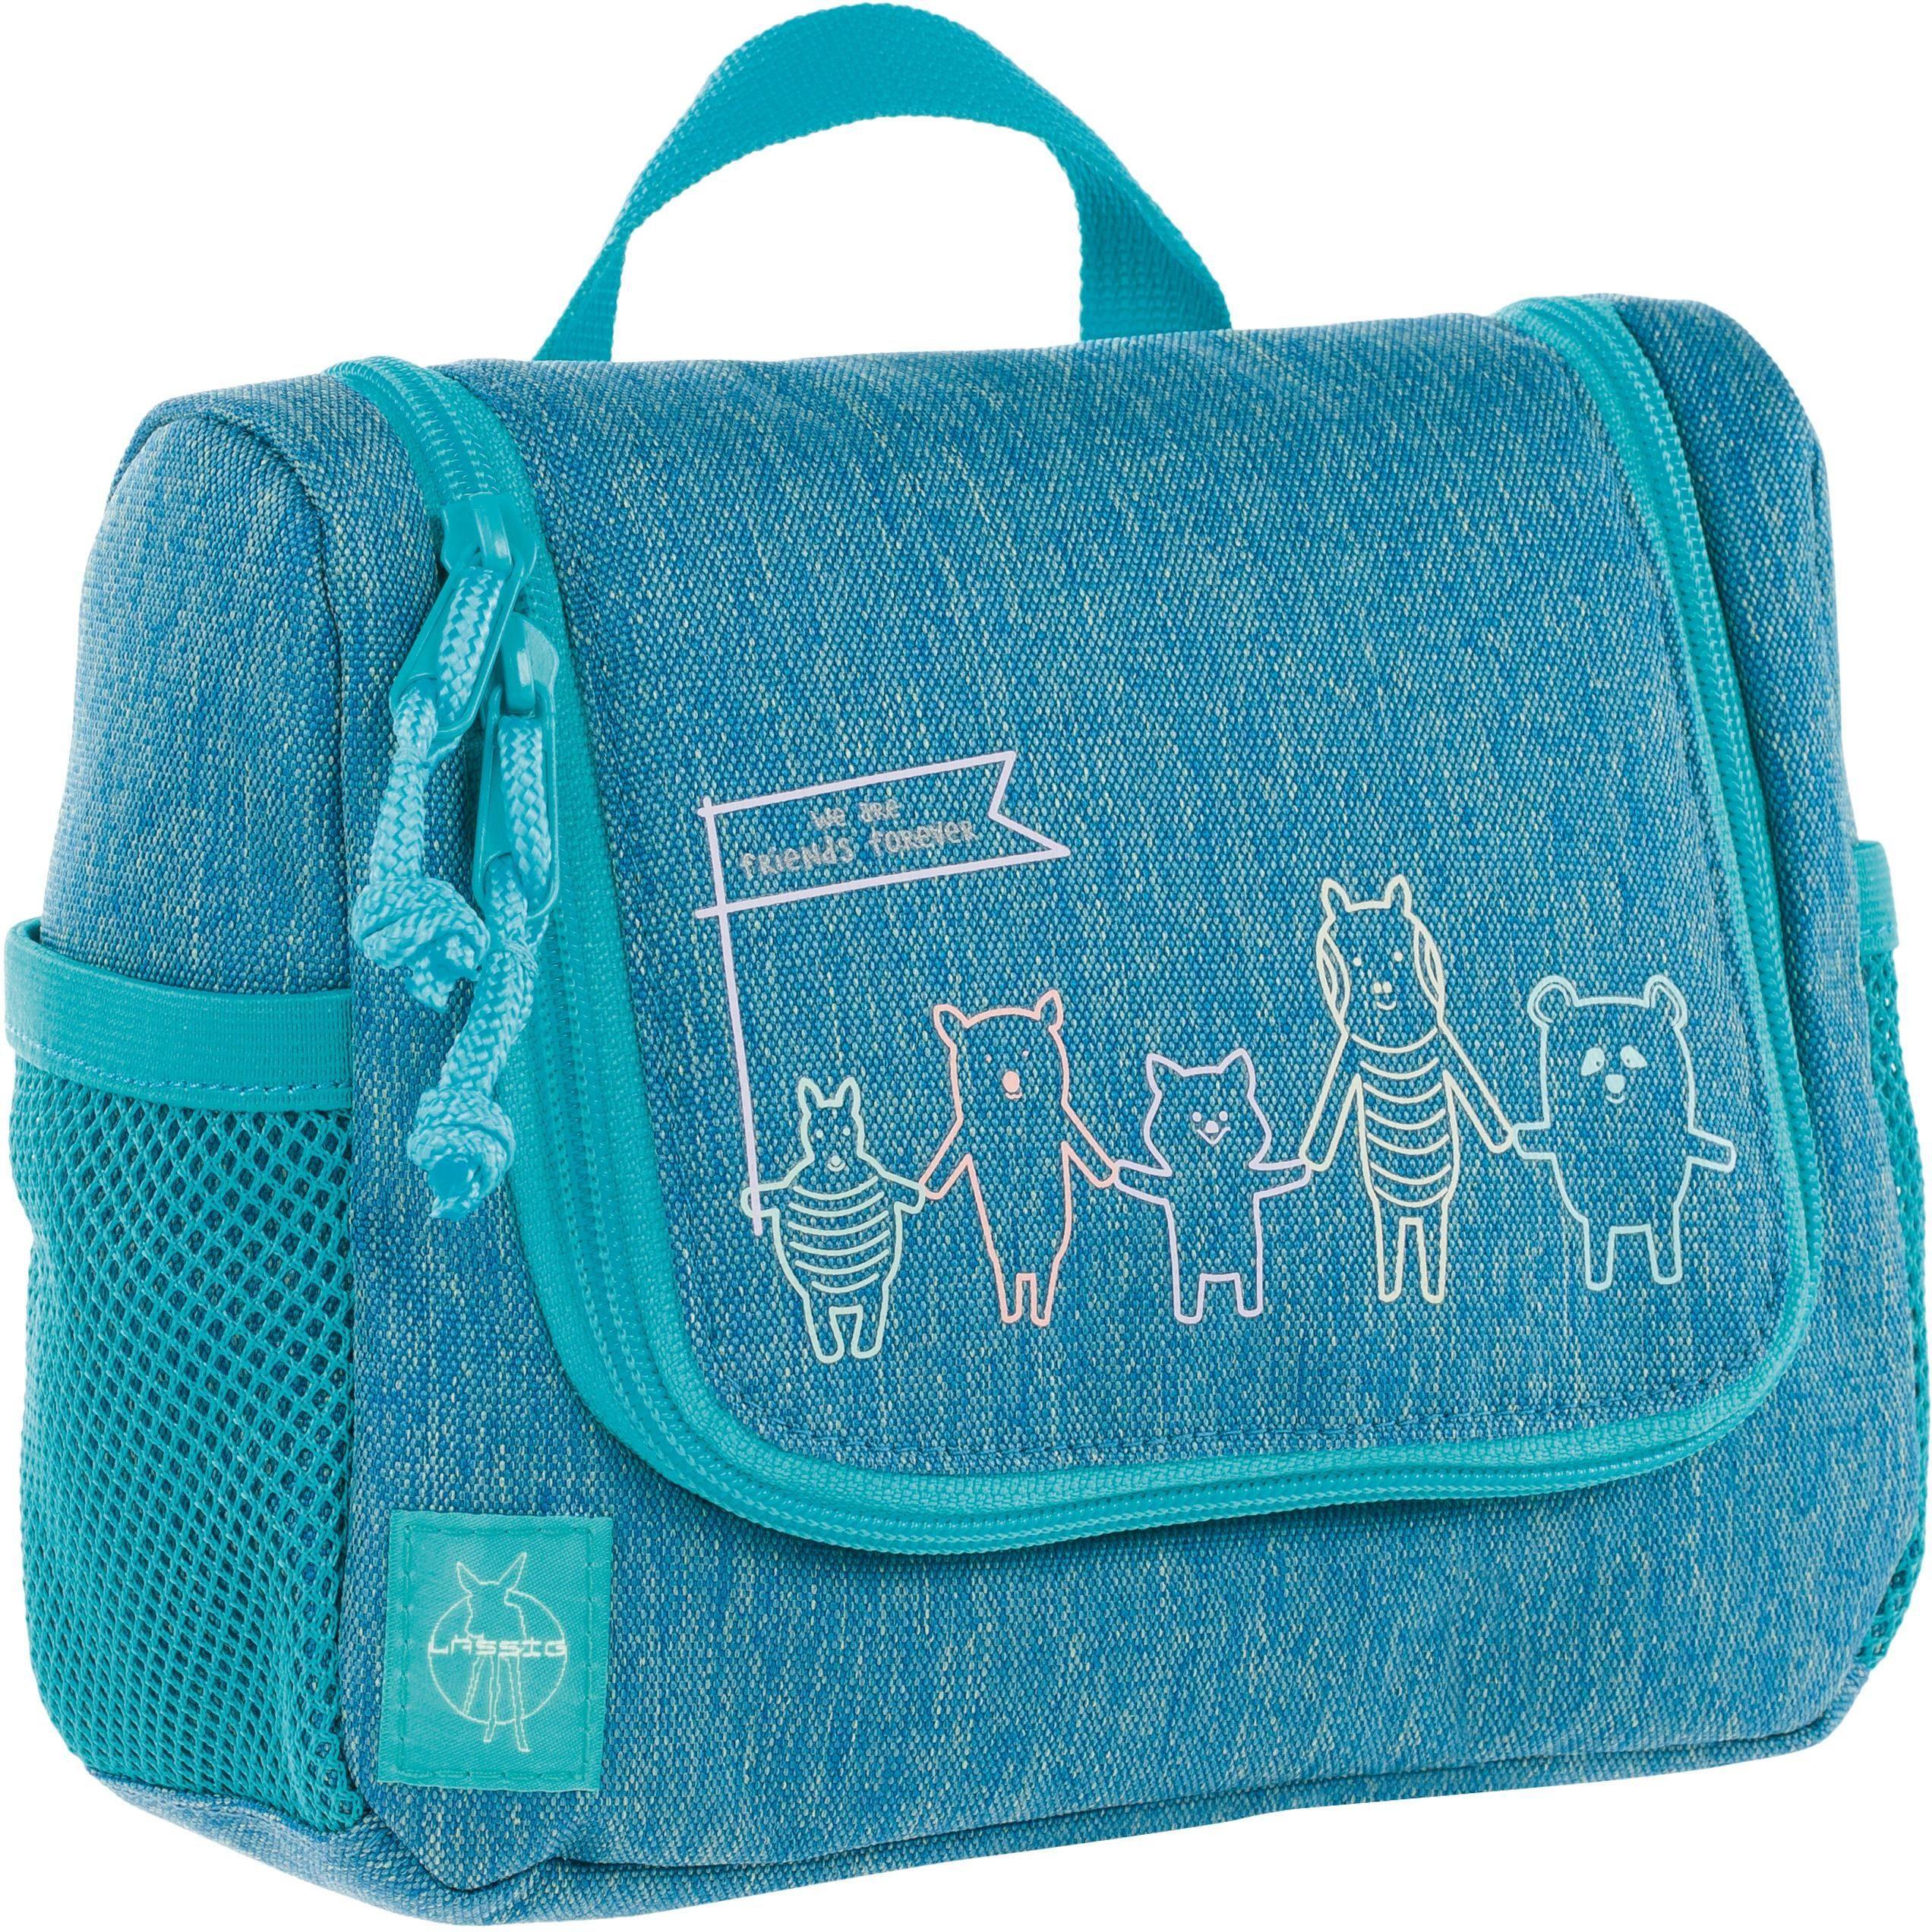 Lässig Kulturbeutel zum Aufhängen, »4Kids Mini Washbag, About Friends, Mélange Blue«